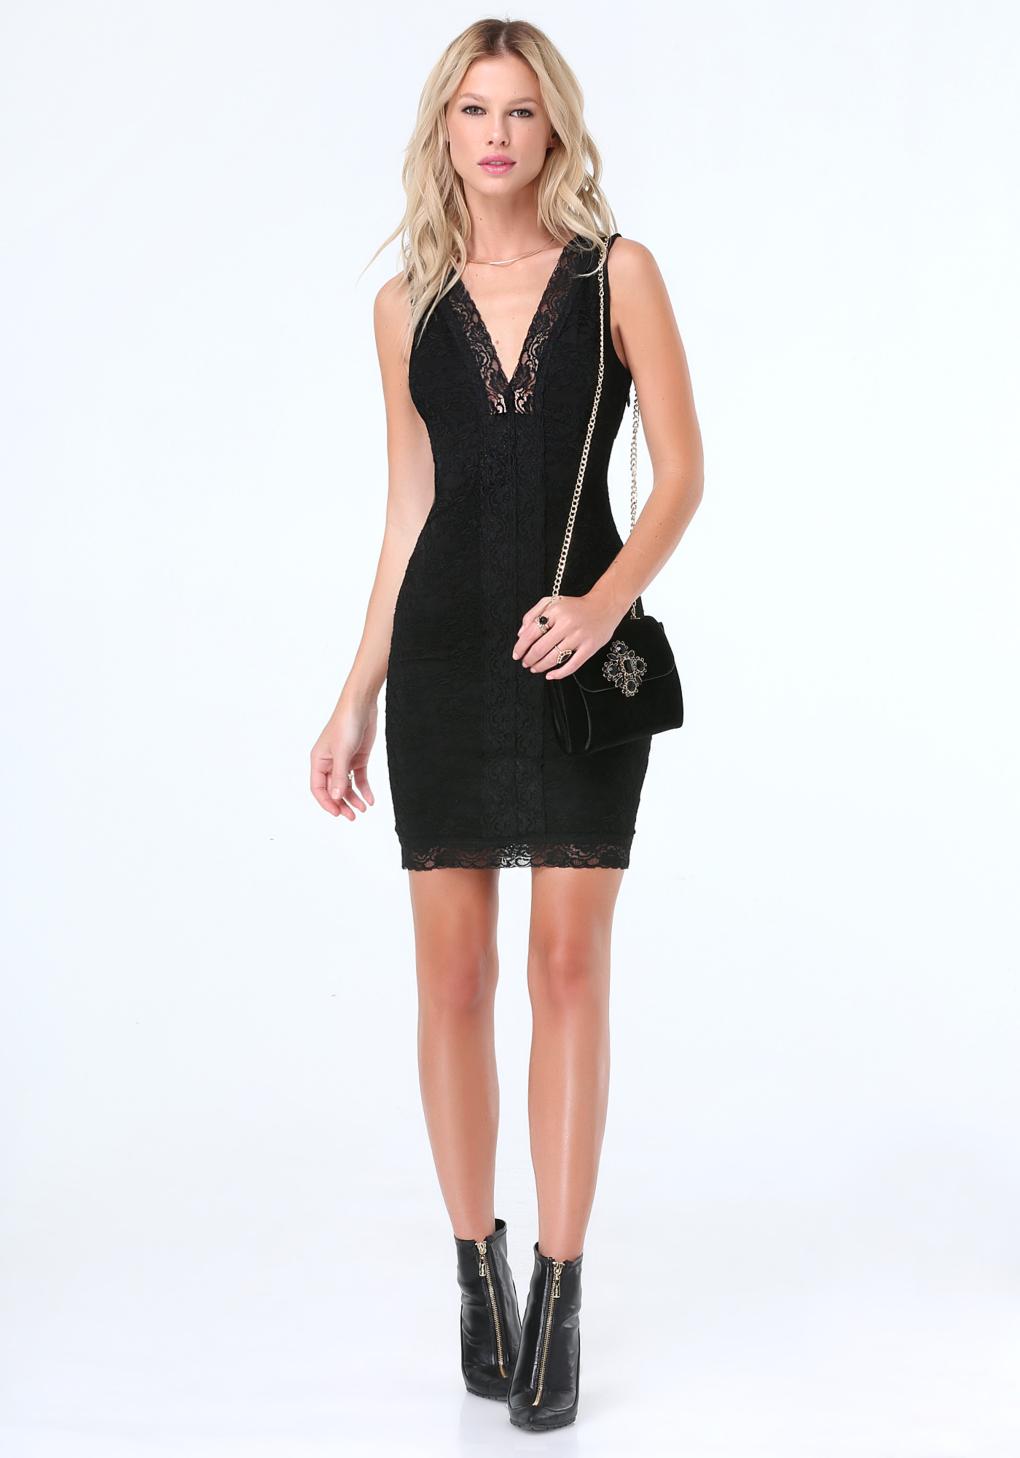 cfff5e89e7b8 Lyst - Bebe Lace Deep V-neck Dress in Black